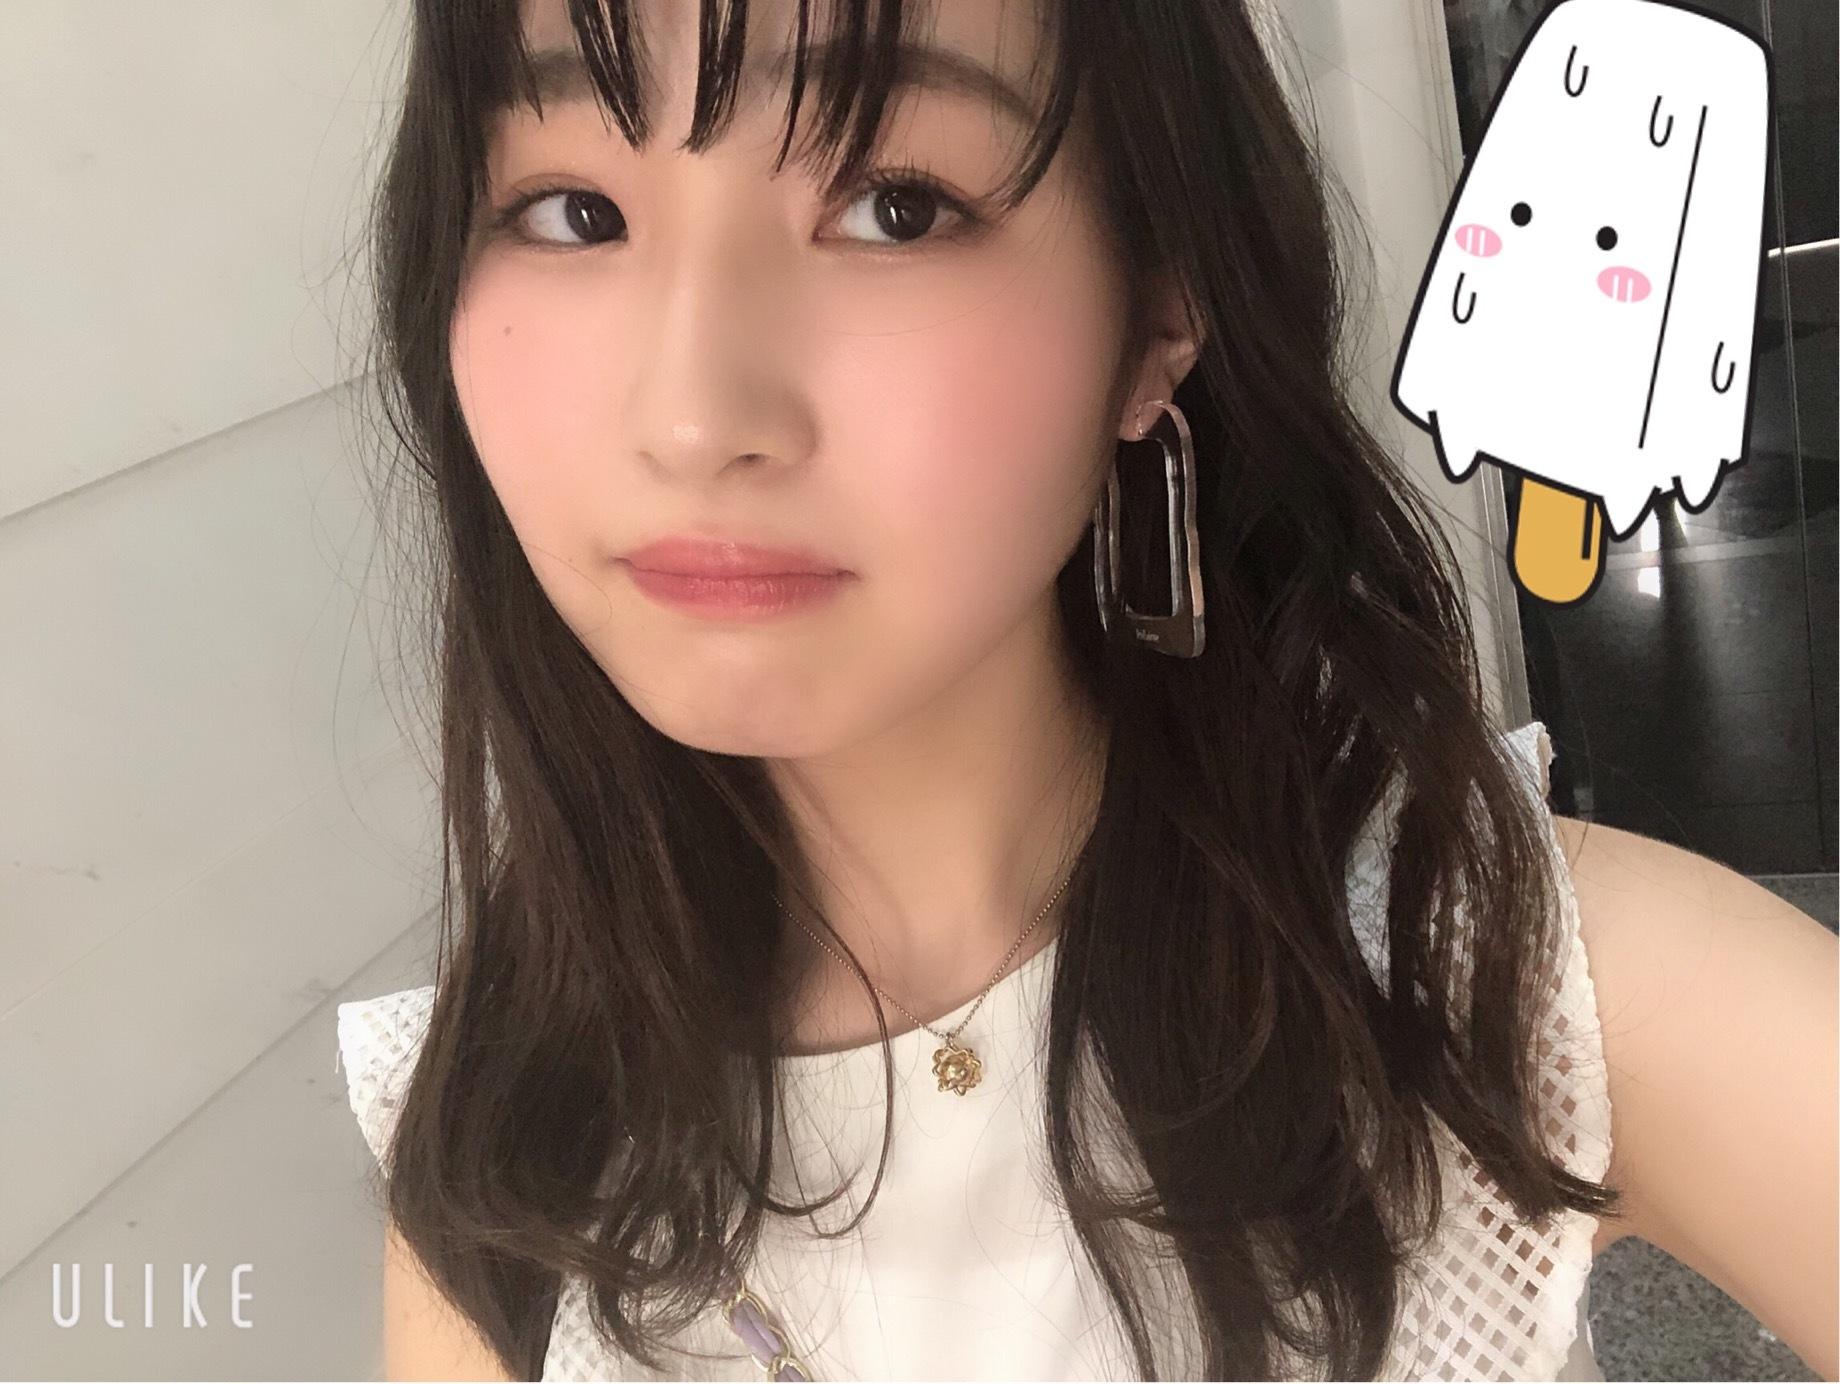 【non-no9月号】アイメイクと匂いのお悩みならお任せ!_1_3